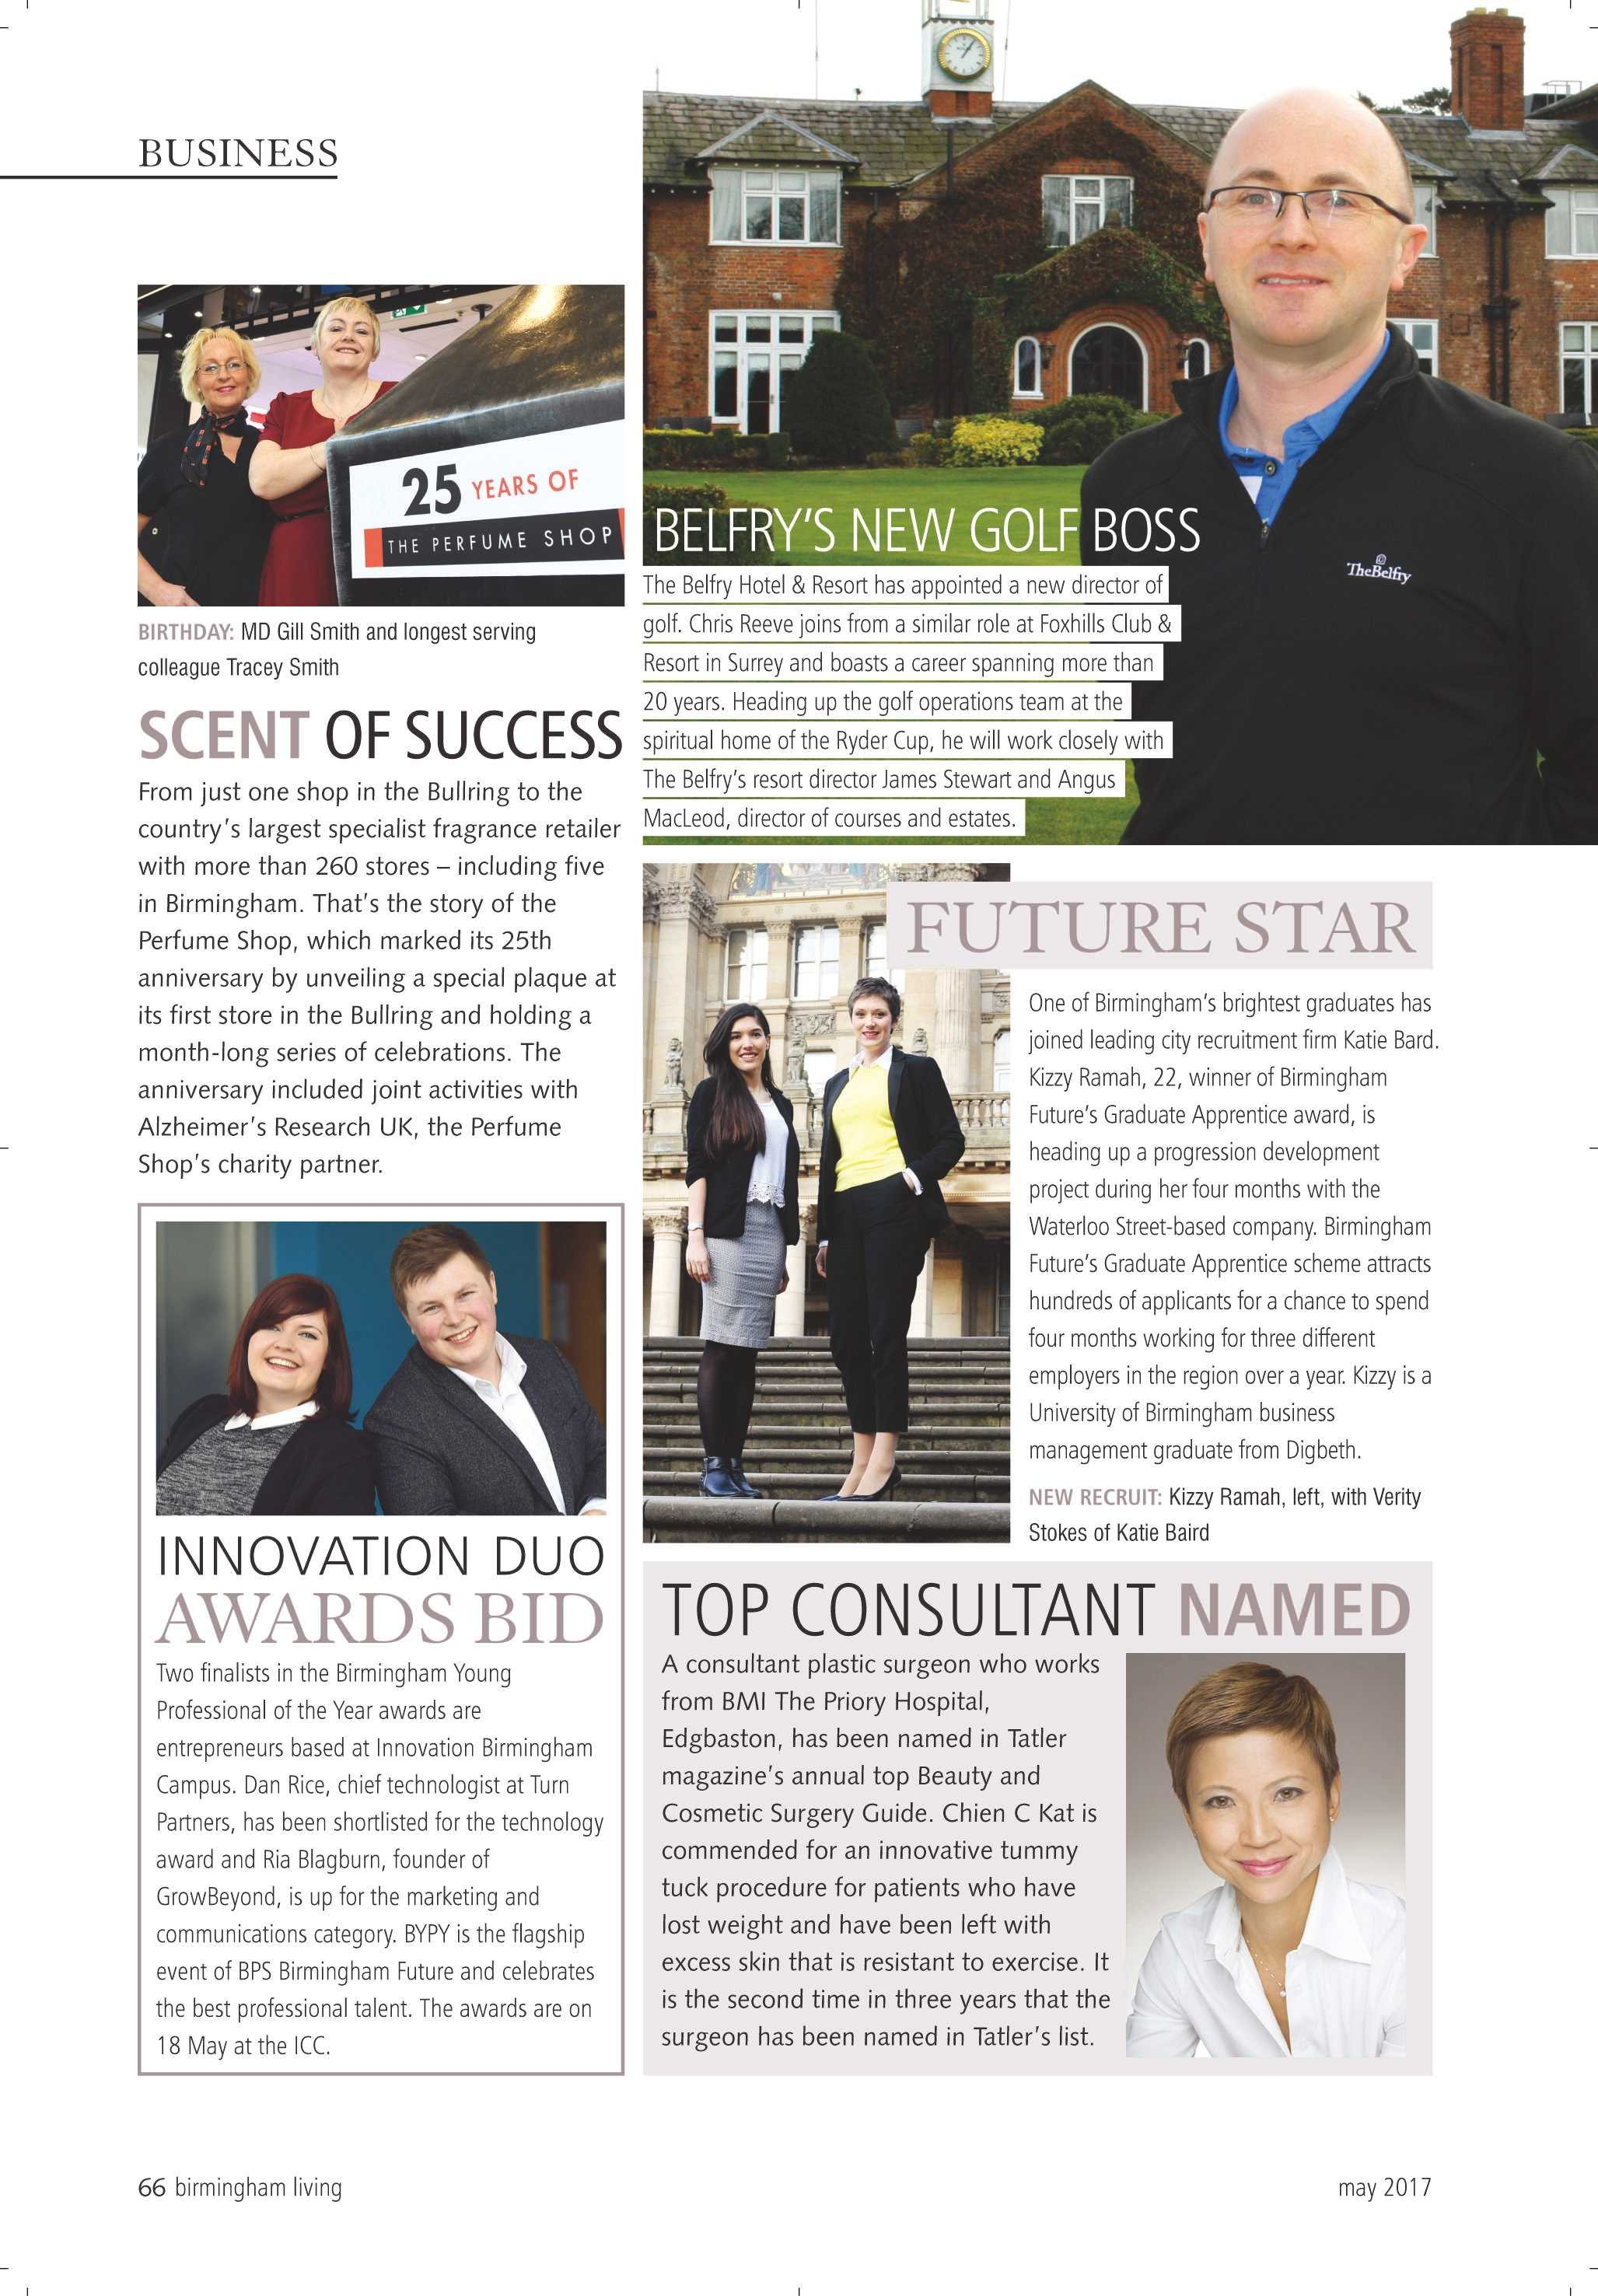 Birmingham Living magazine names CC Kat as top cosmetic